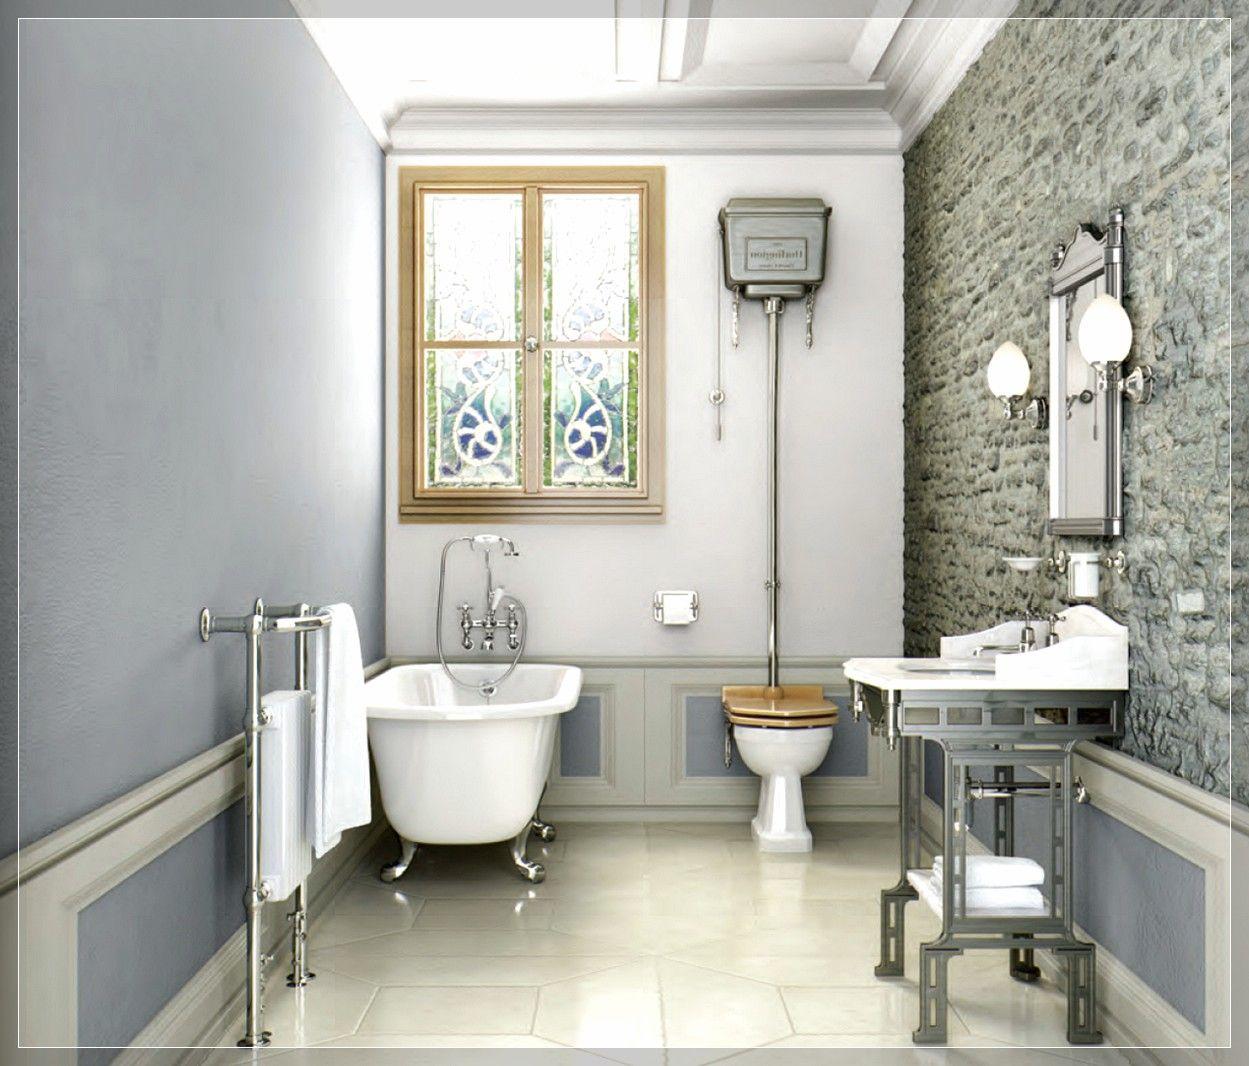 latest posts under: bathroom wall decor | ideas | pinterest | tile